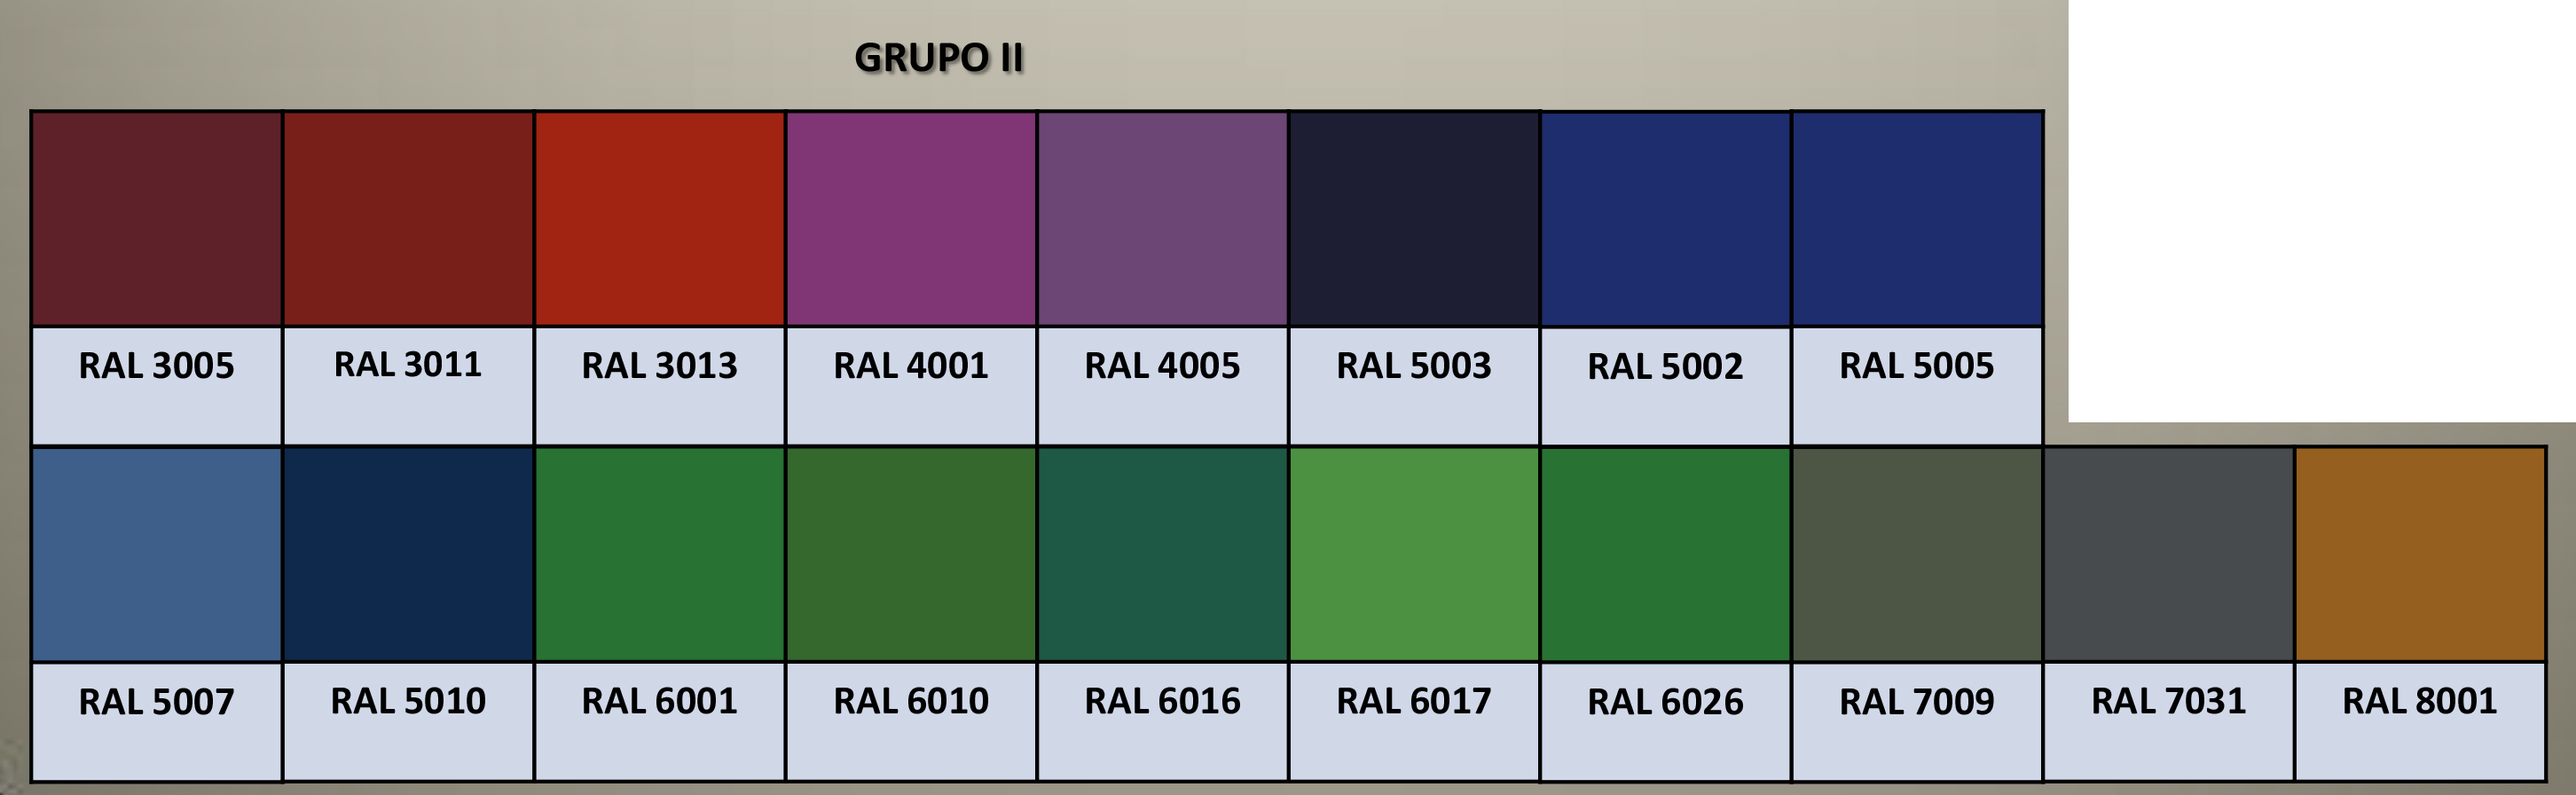 Carta Colores RAL - Grupò 2